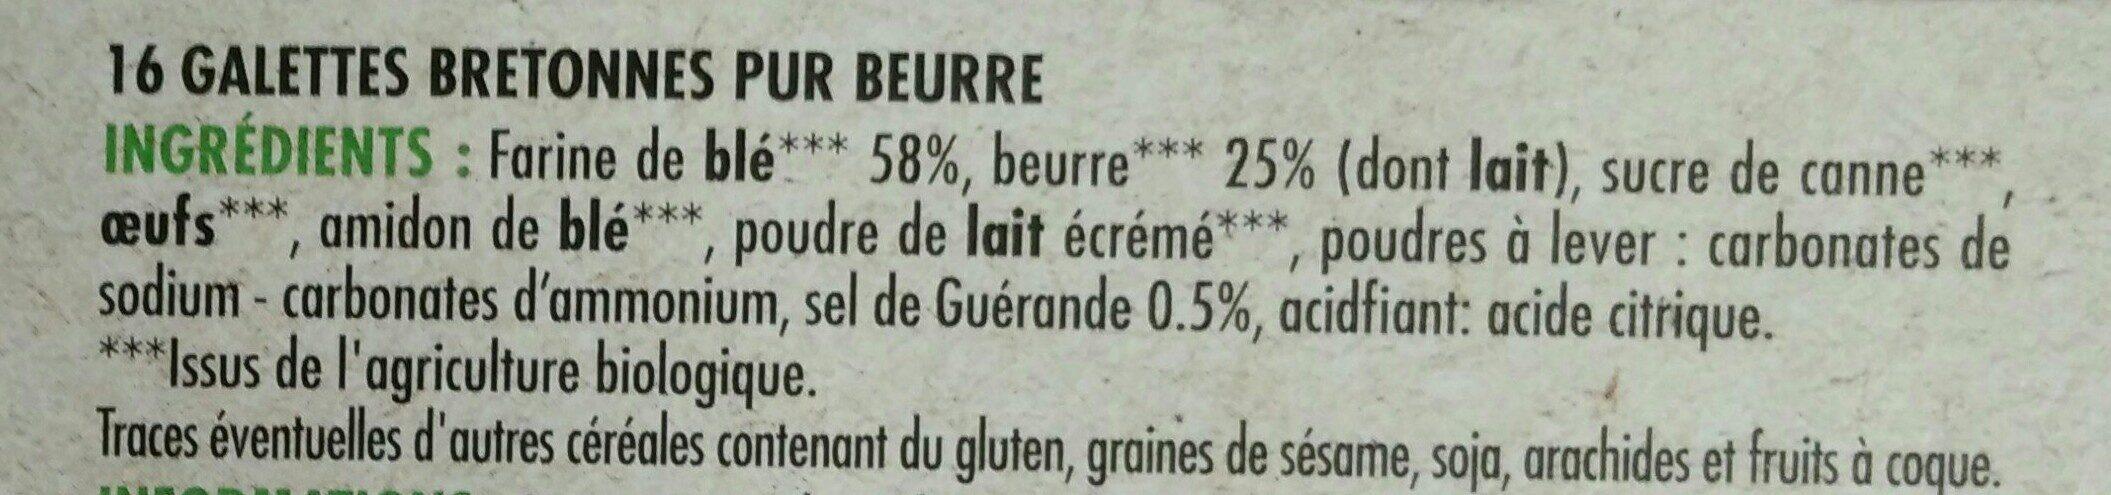 Galettes bretonnes pur beurre bio - Ingredienti - fr